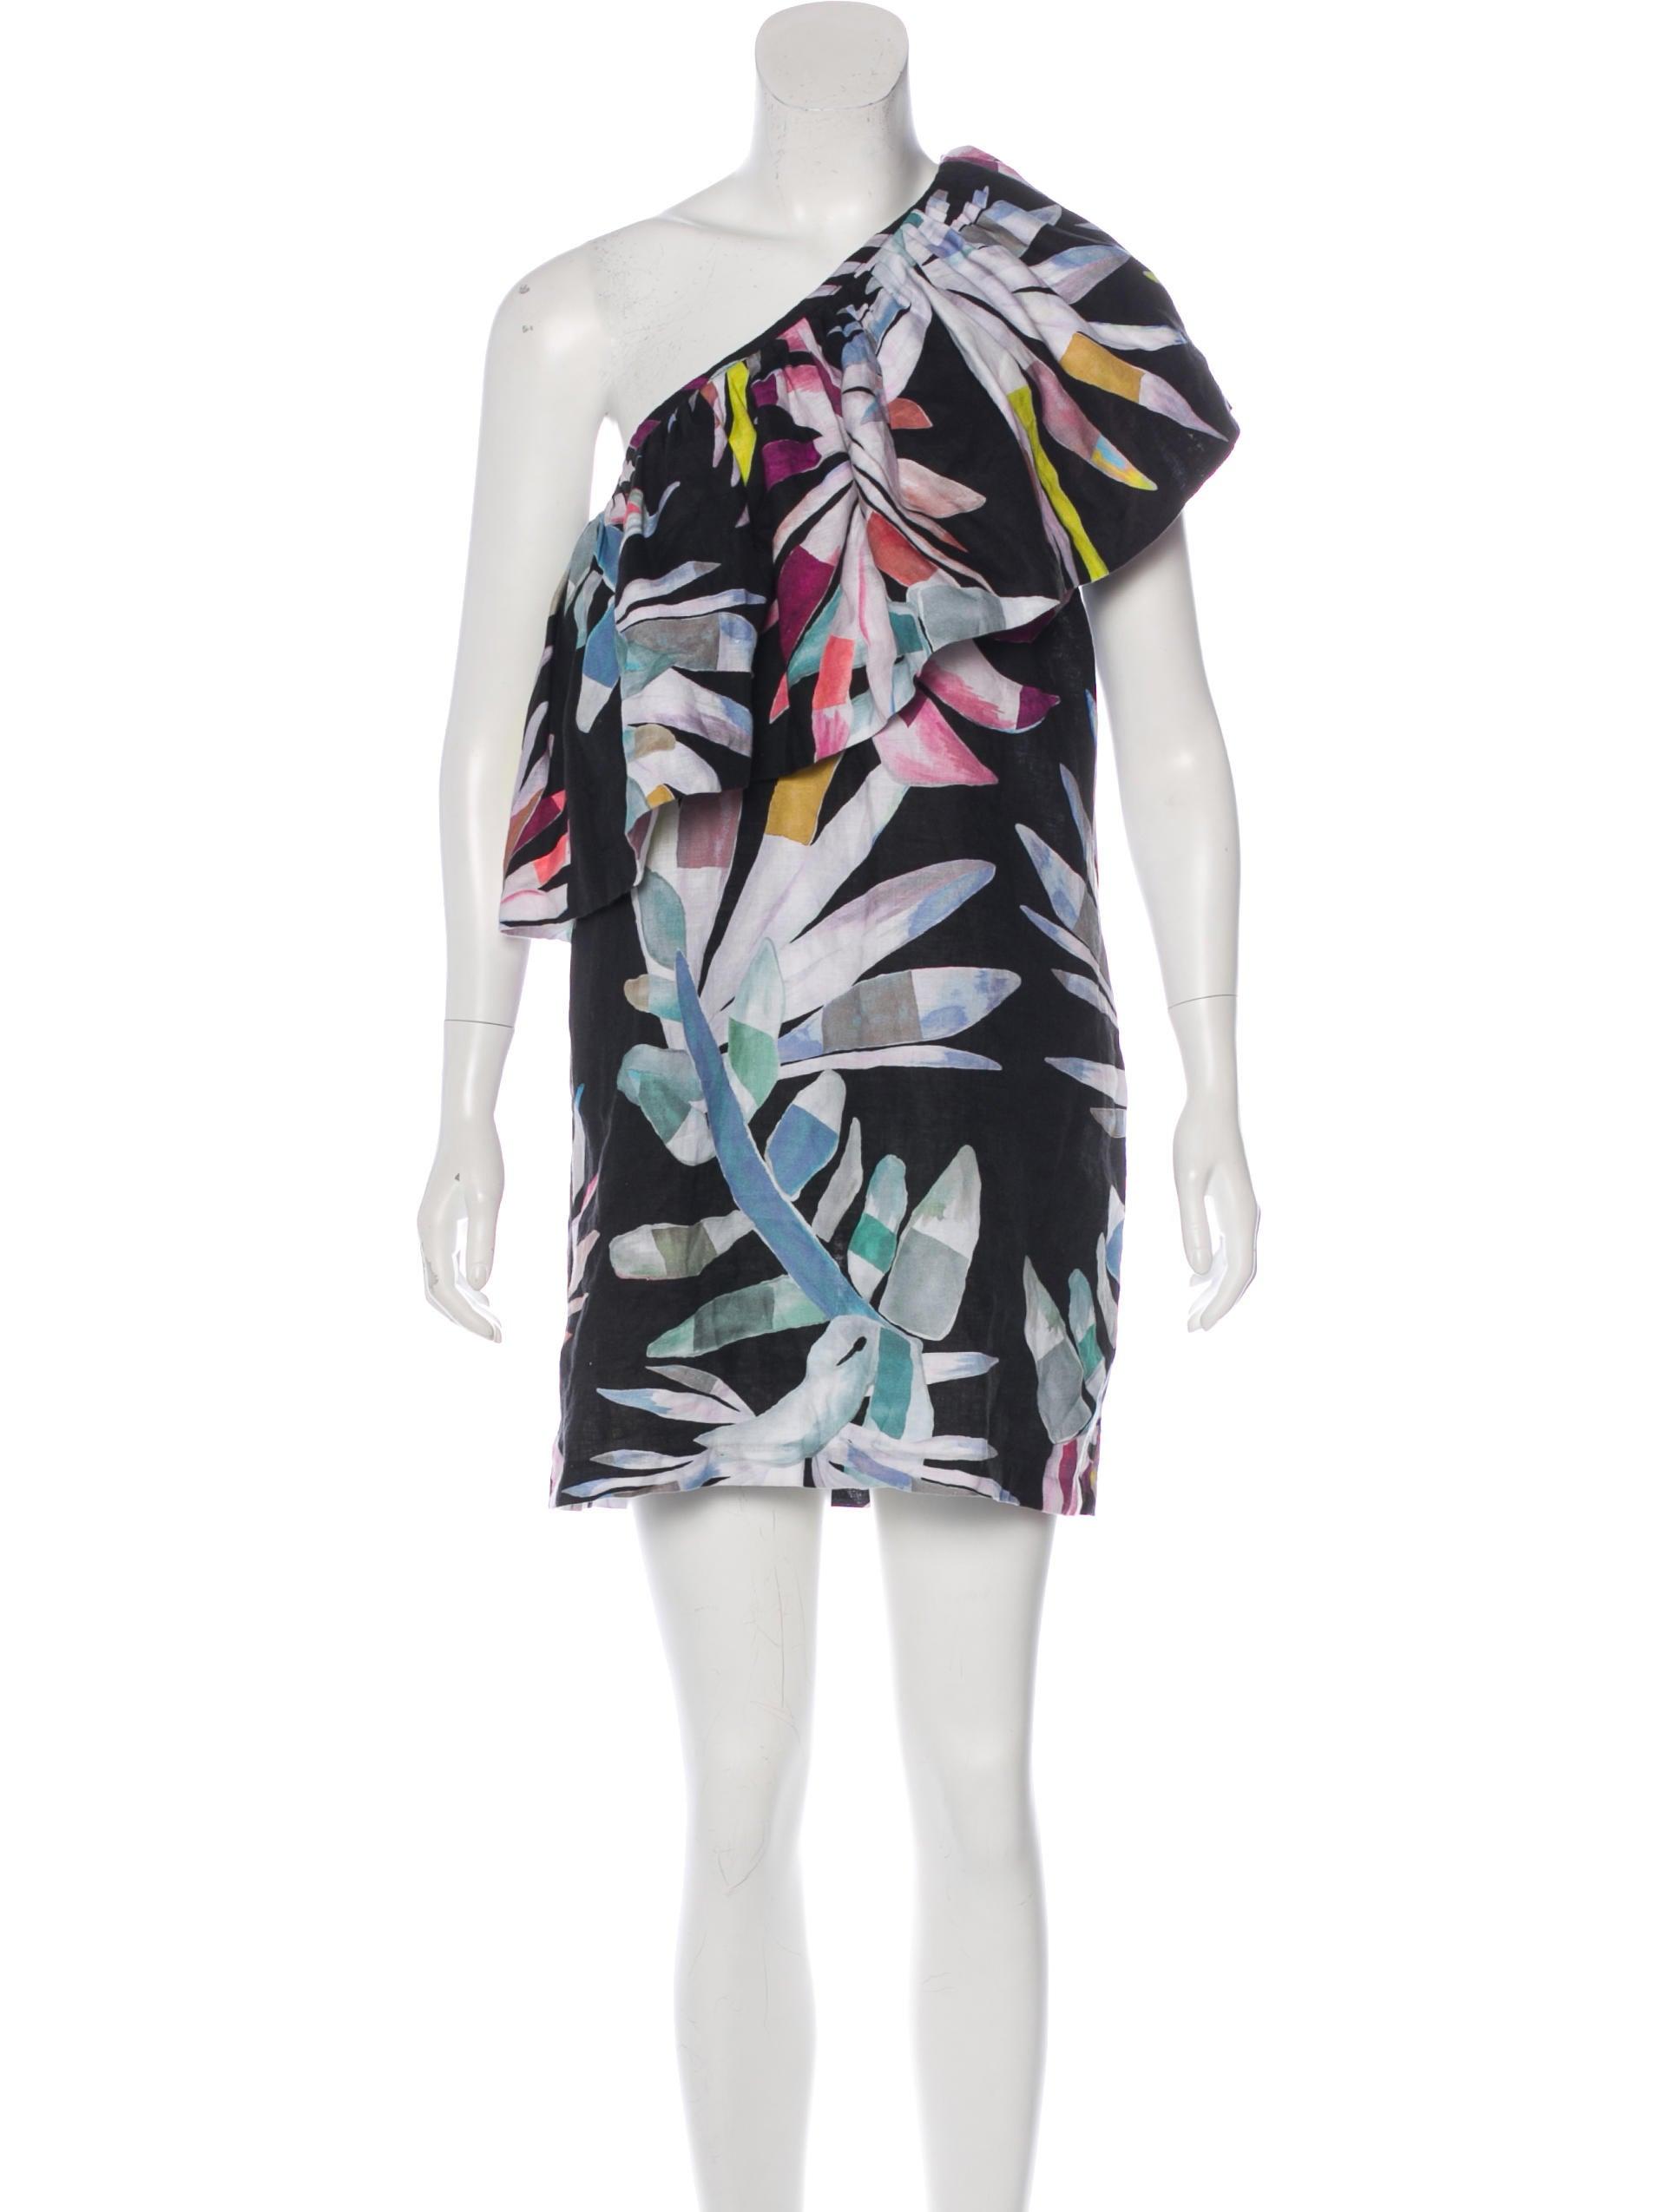 c1f11aeb855 Mara Hoffman Xylophone Printed Dress - Clothing - WHX22989